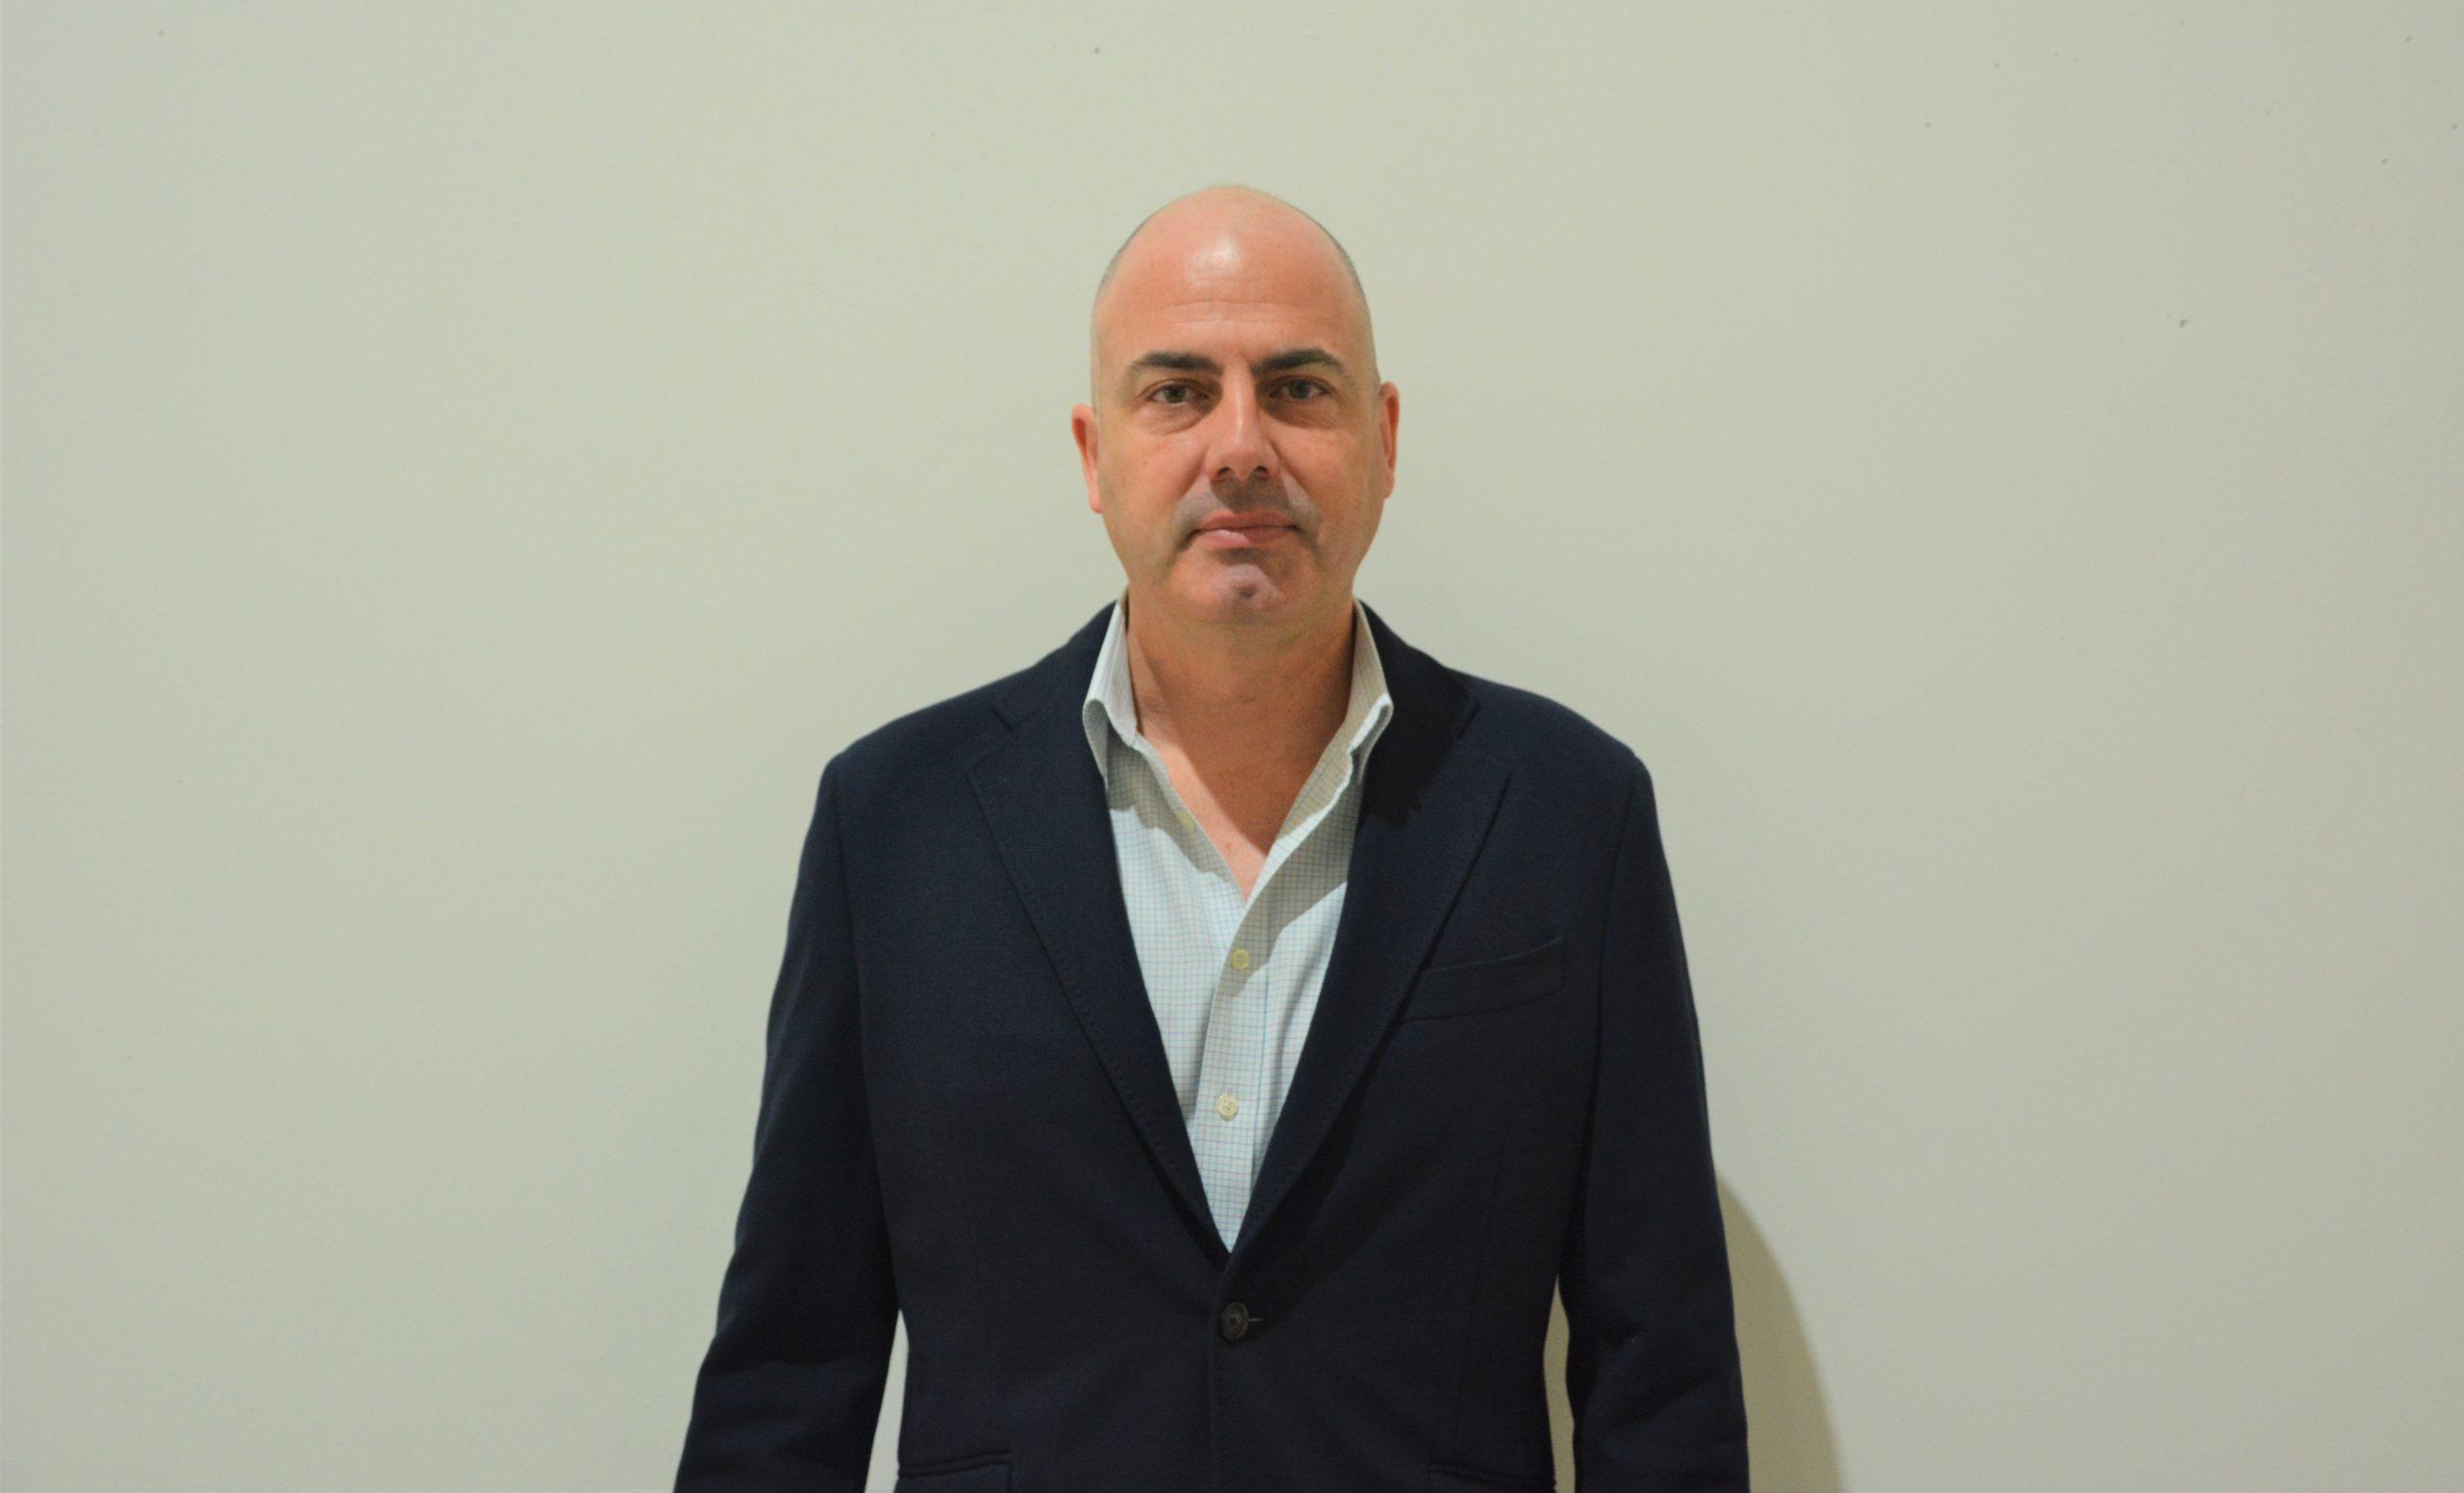 Alejandro Martin